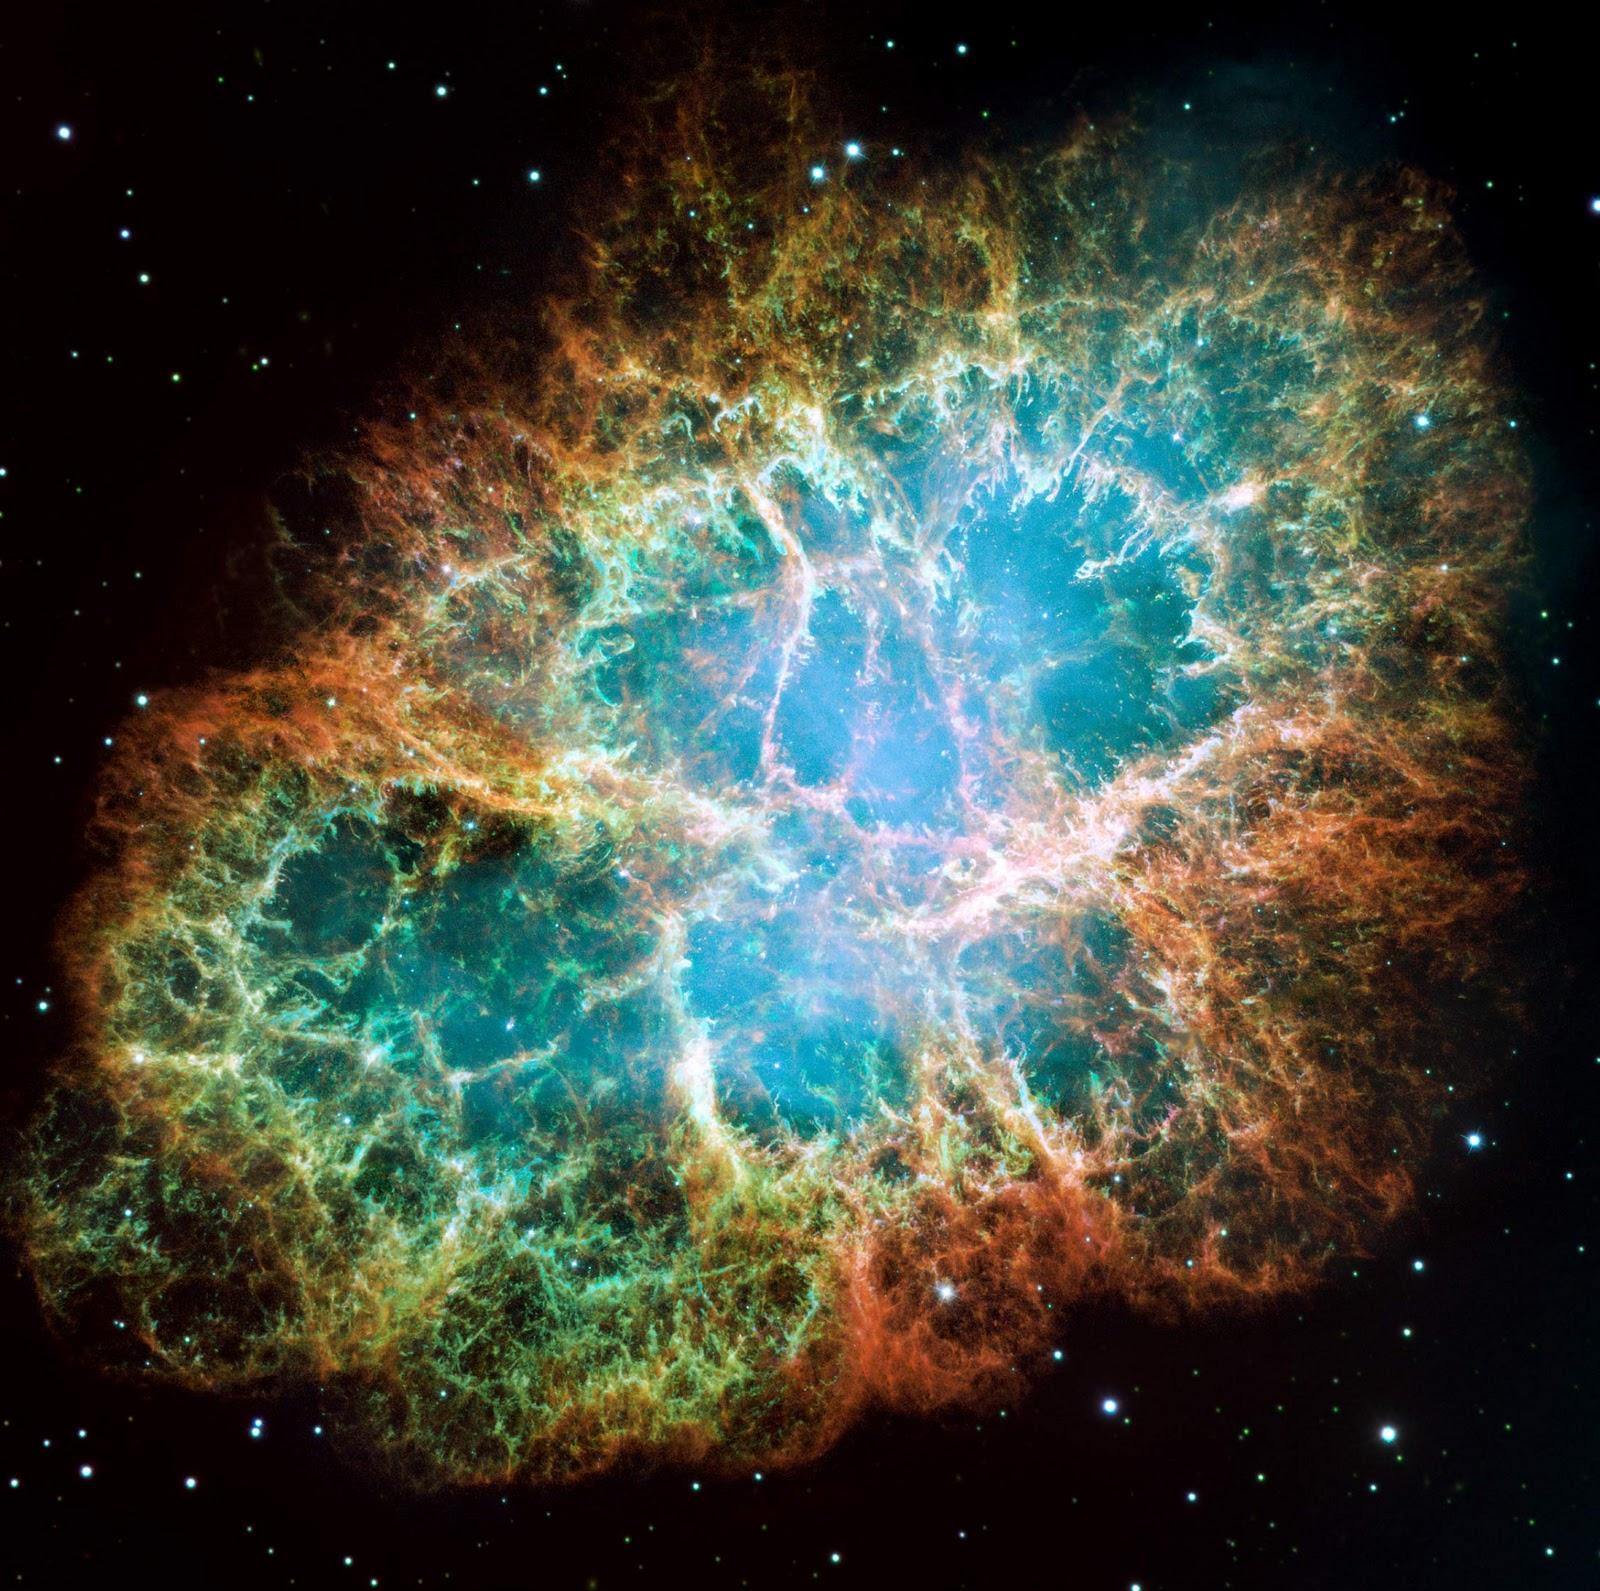 nebula weed wallpaper - photo #9